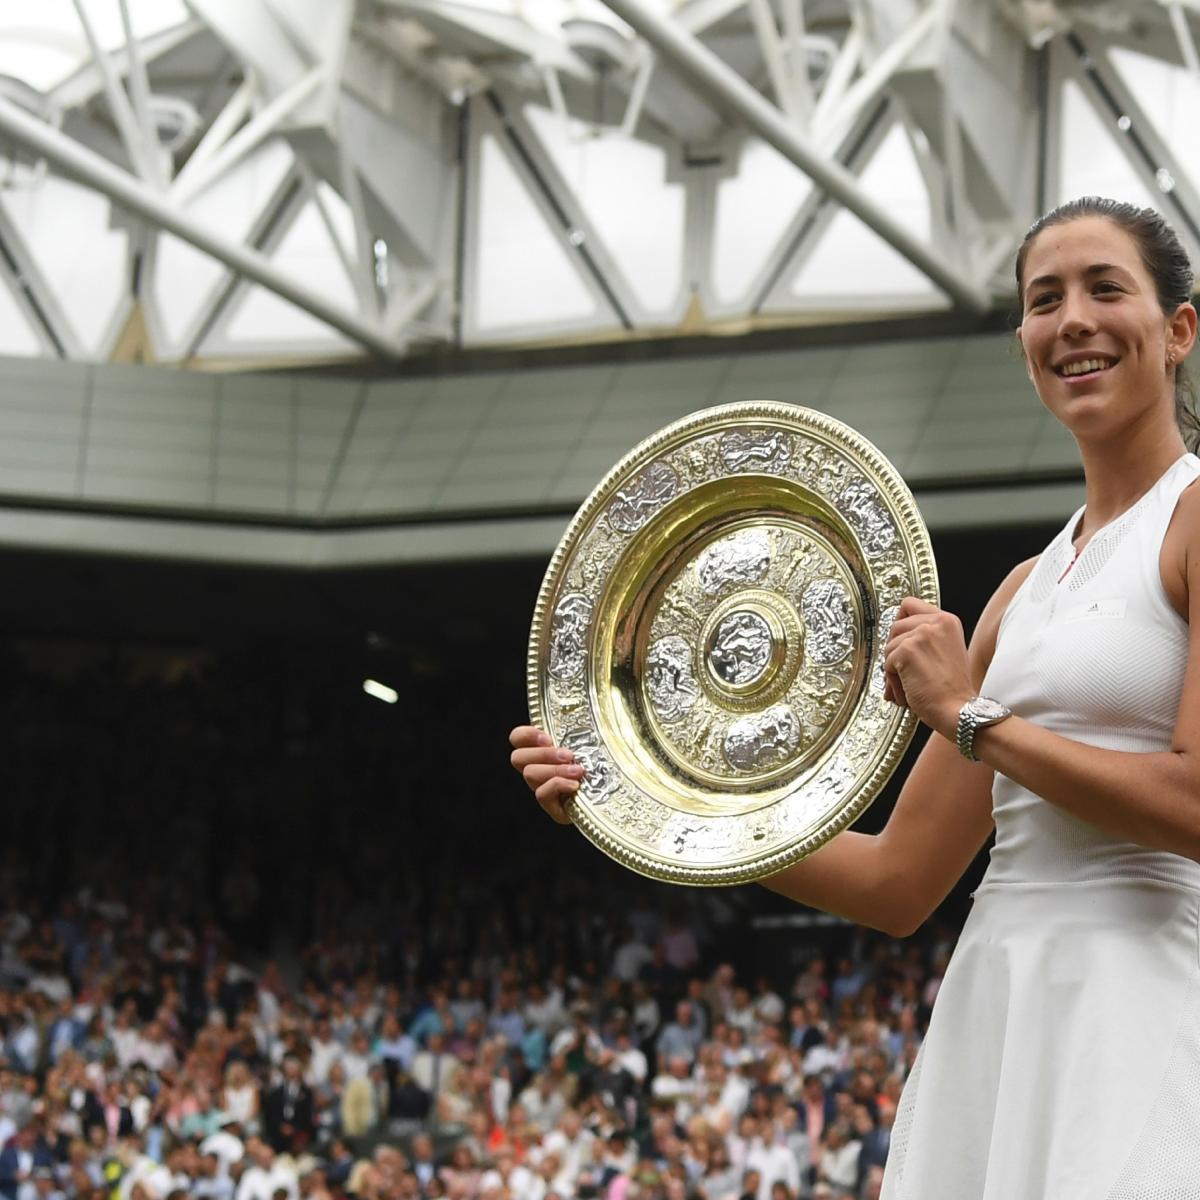 2017 Wimbledon Finals Brackets Back To The Future: Wimbledon 2017 Results: Women's Final Score And Men's